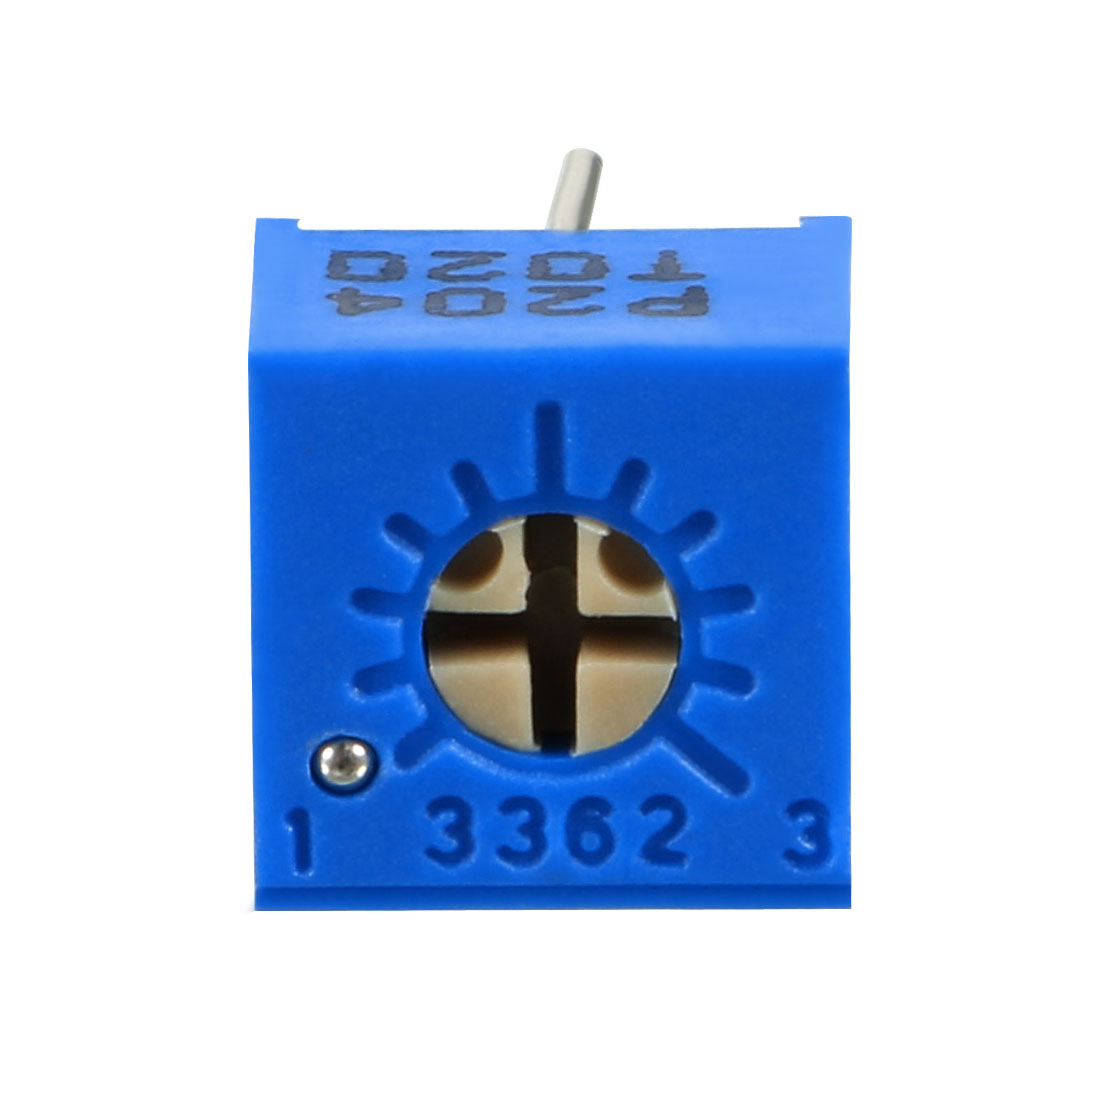 Resistors 200k Ohm Top Adjustment Horizontal Cermet Potentiometer 20 Pcs - image 4 de 6